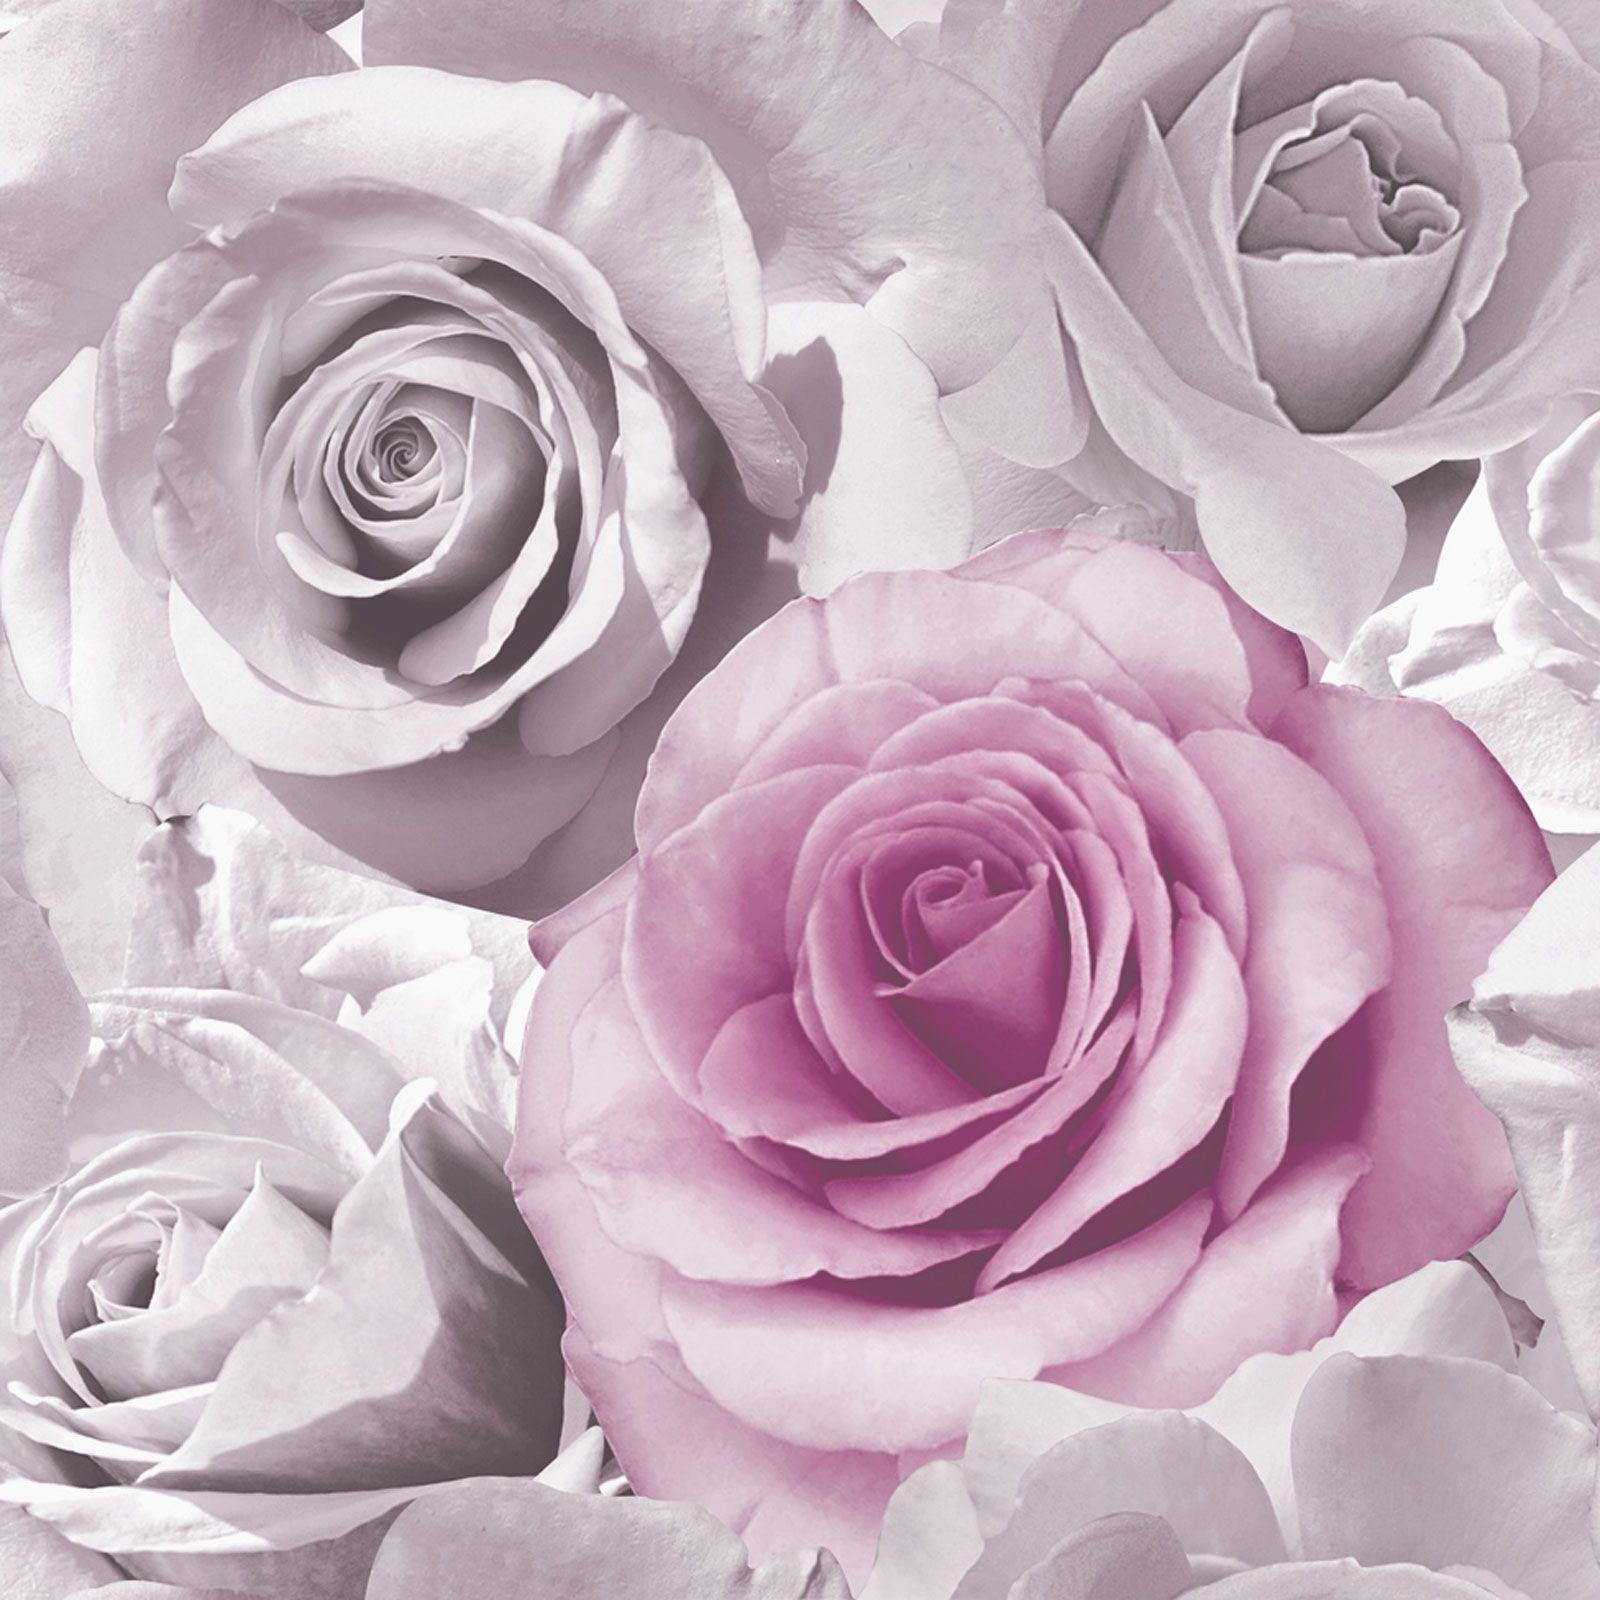 Floral Flowers Wallpaper Metallic Glitter Roses Ginkgo Blooms